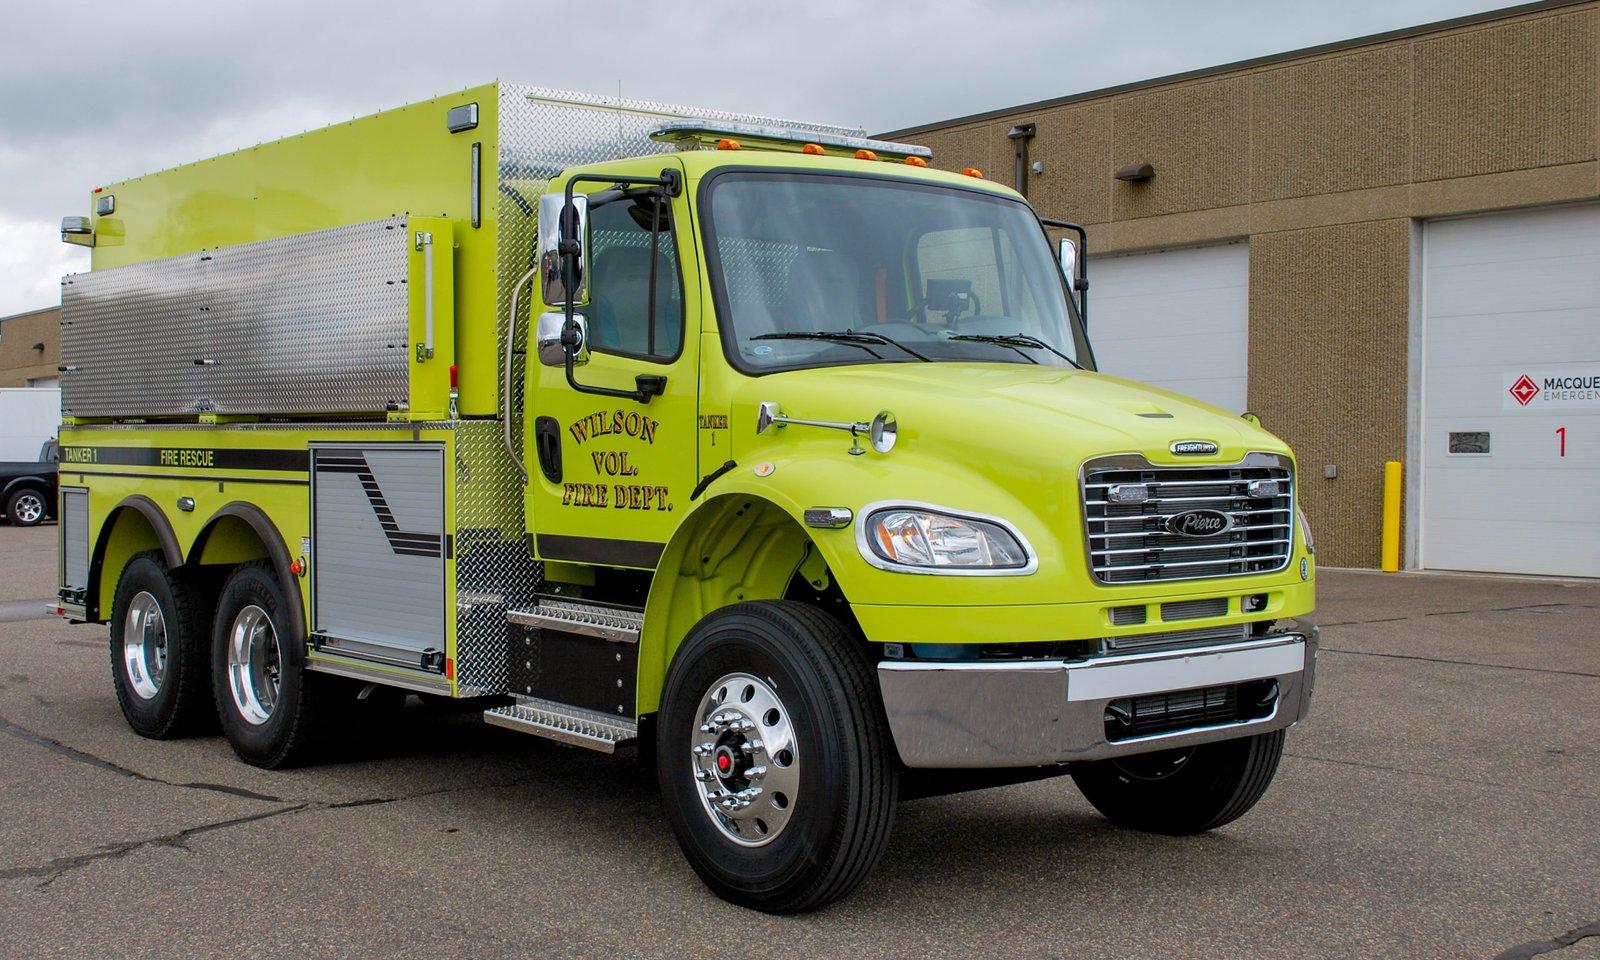 Wilson Fire Department - Tanker